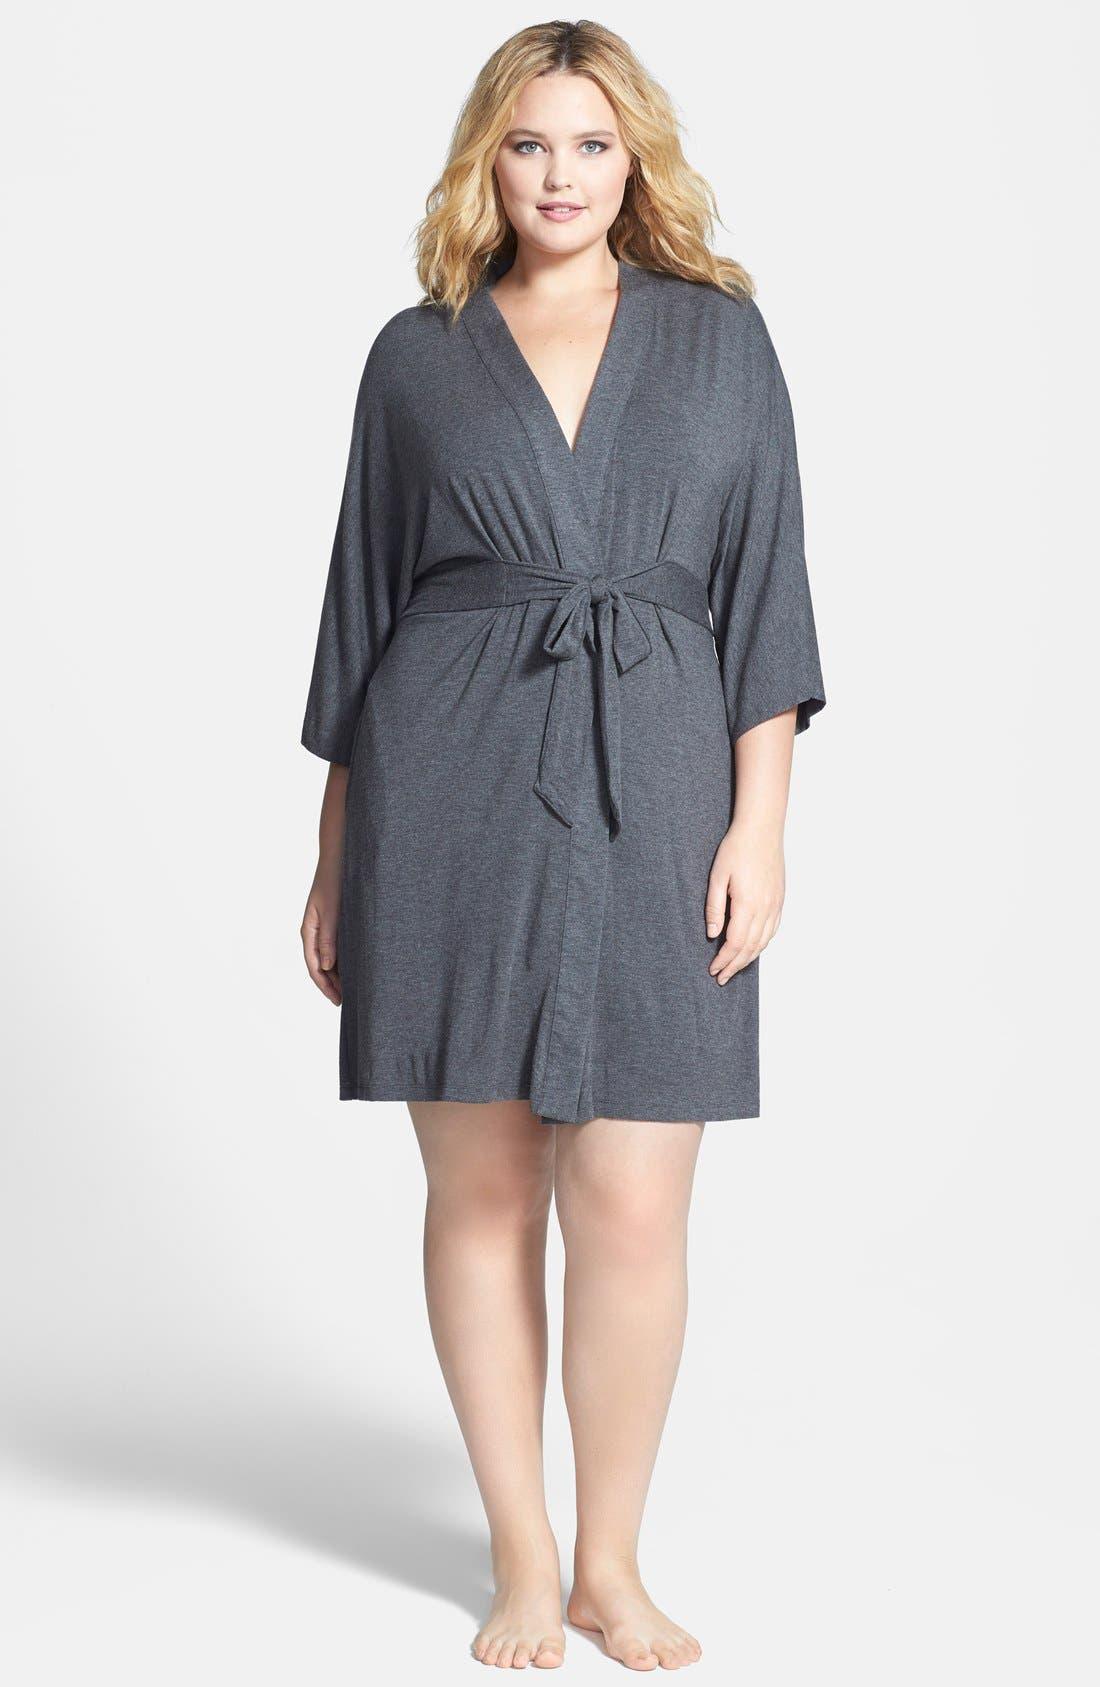 DKNY 'Urban Essentials' Robe (Plus Size)